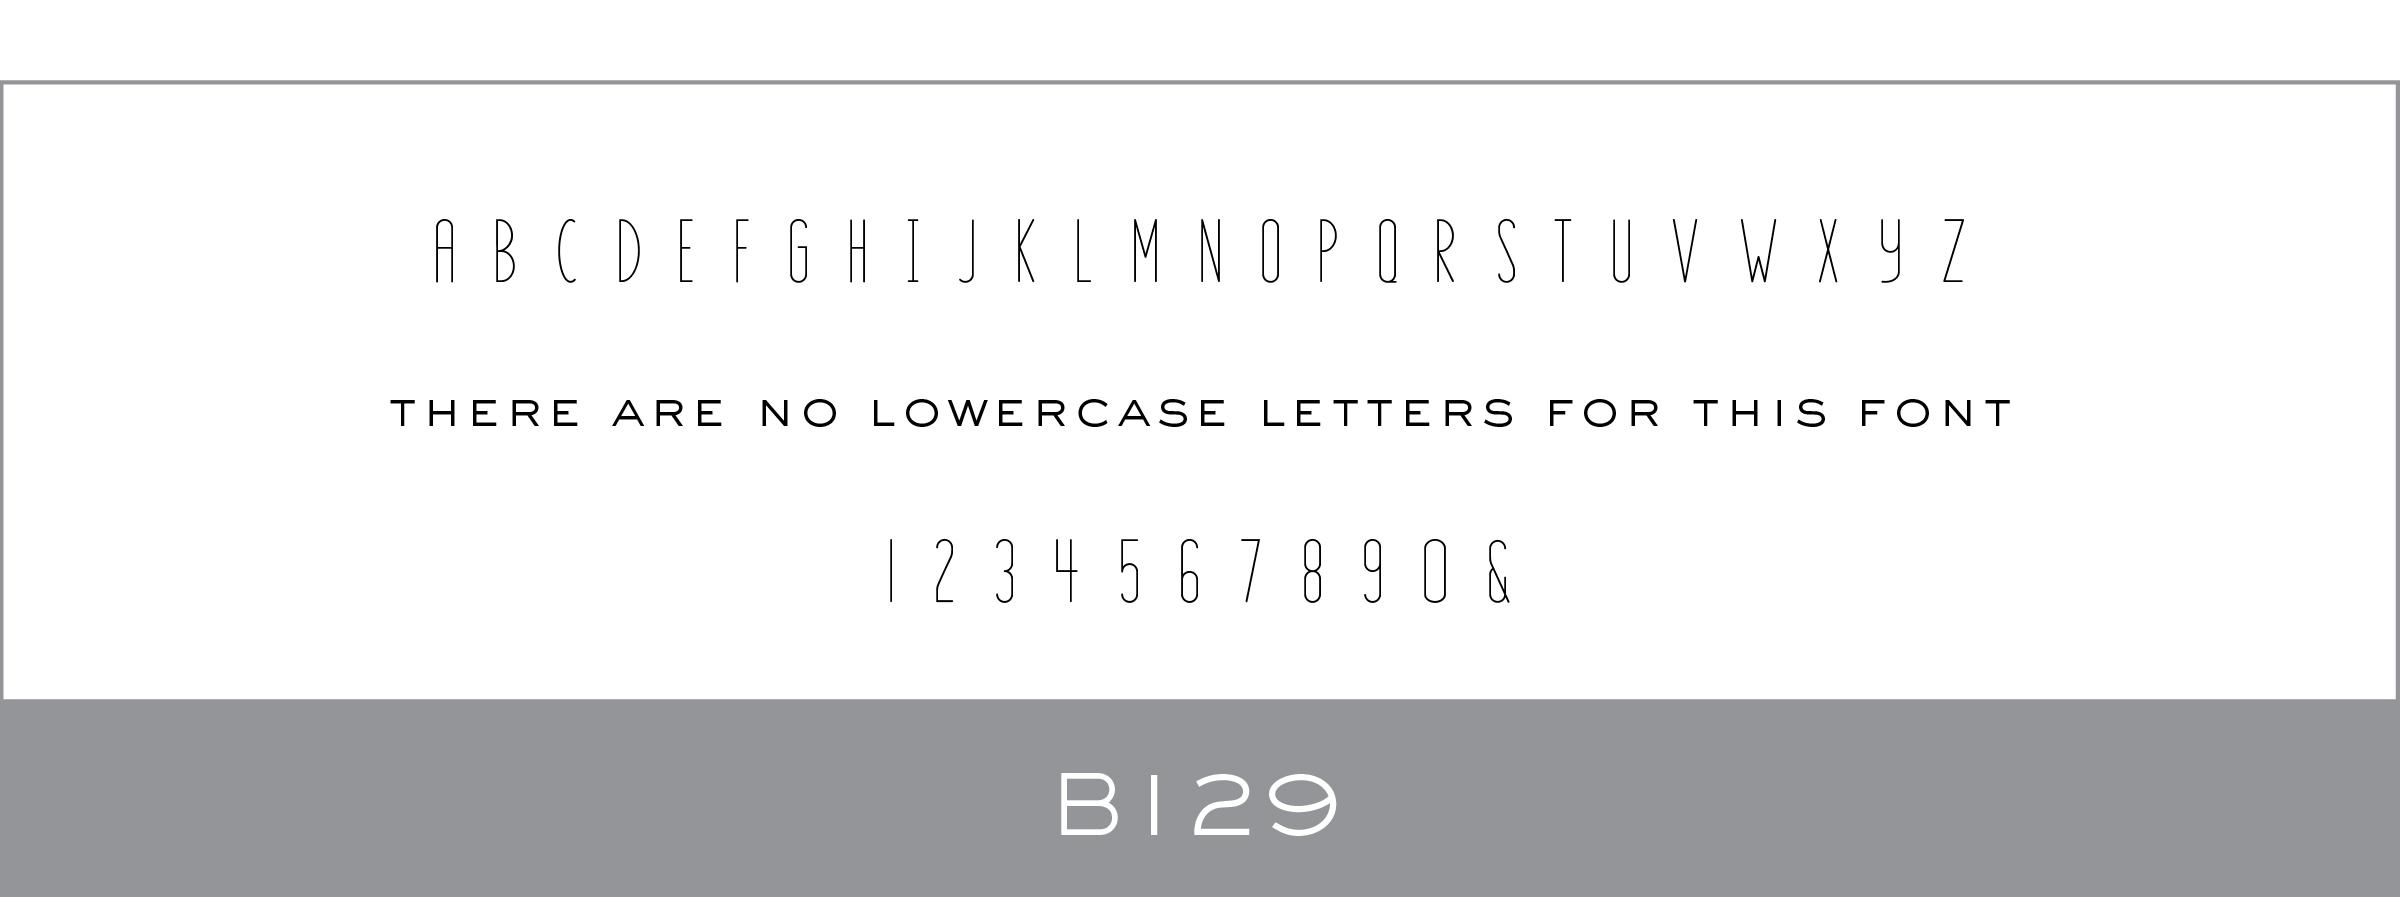 B129_Haute_Papier_Font.jpg